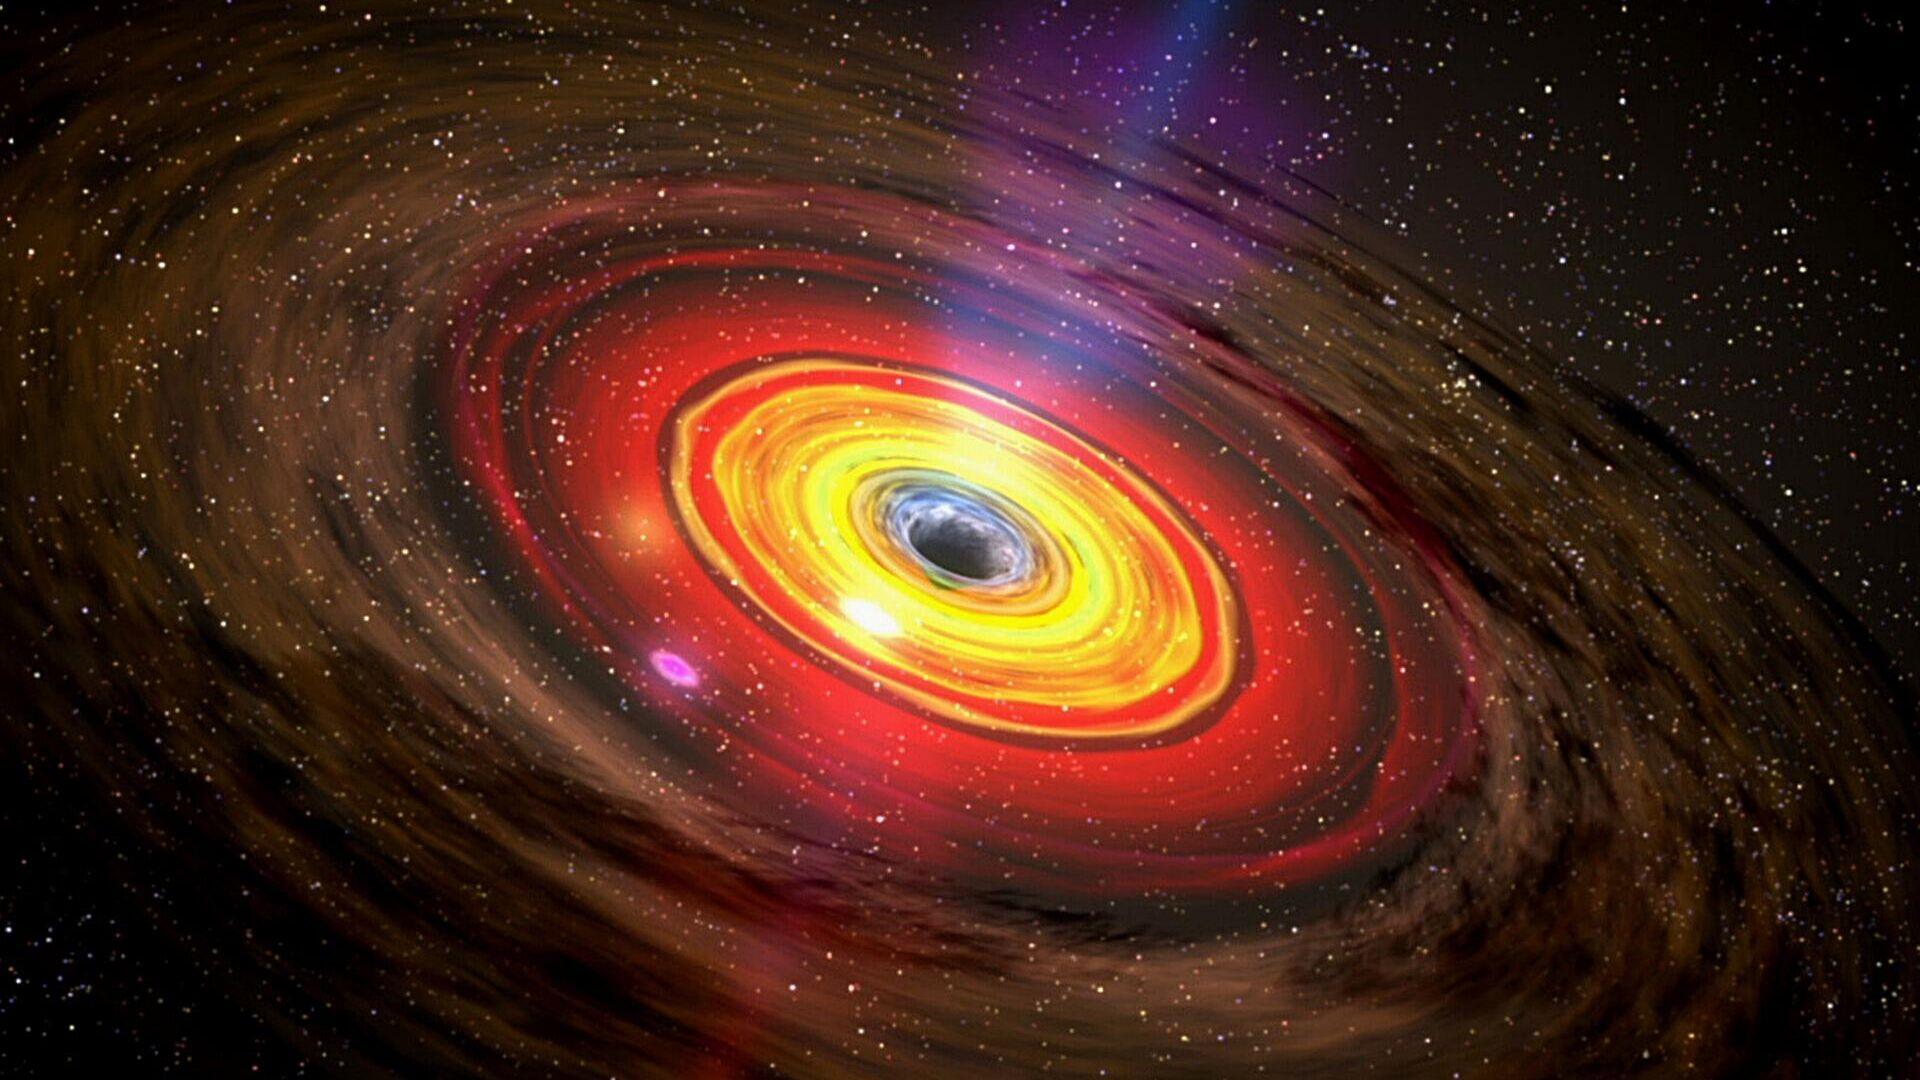 Un agujero negro, ilustración - Sputnik Mundo, 1920, 03.03.2021